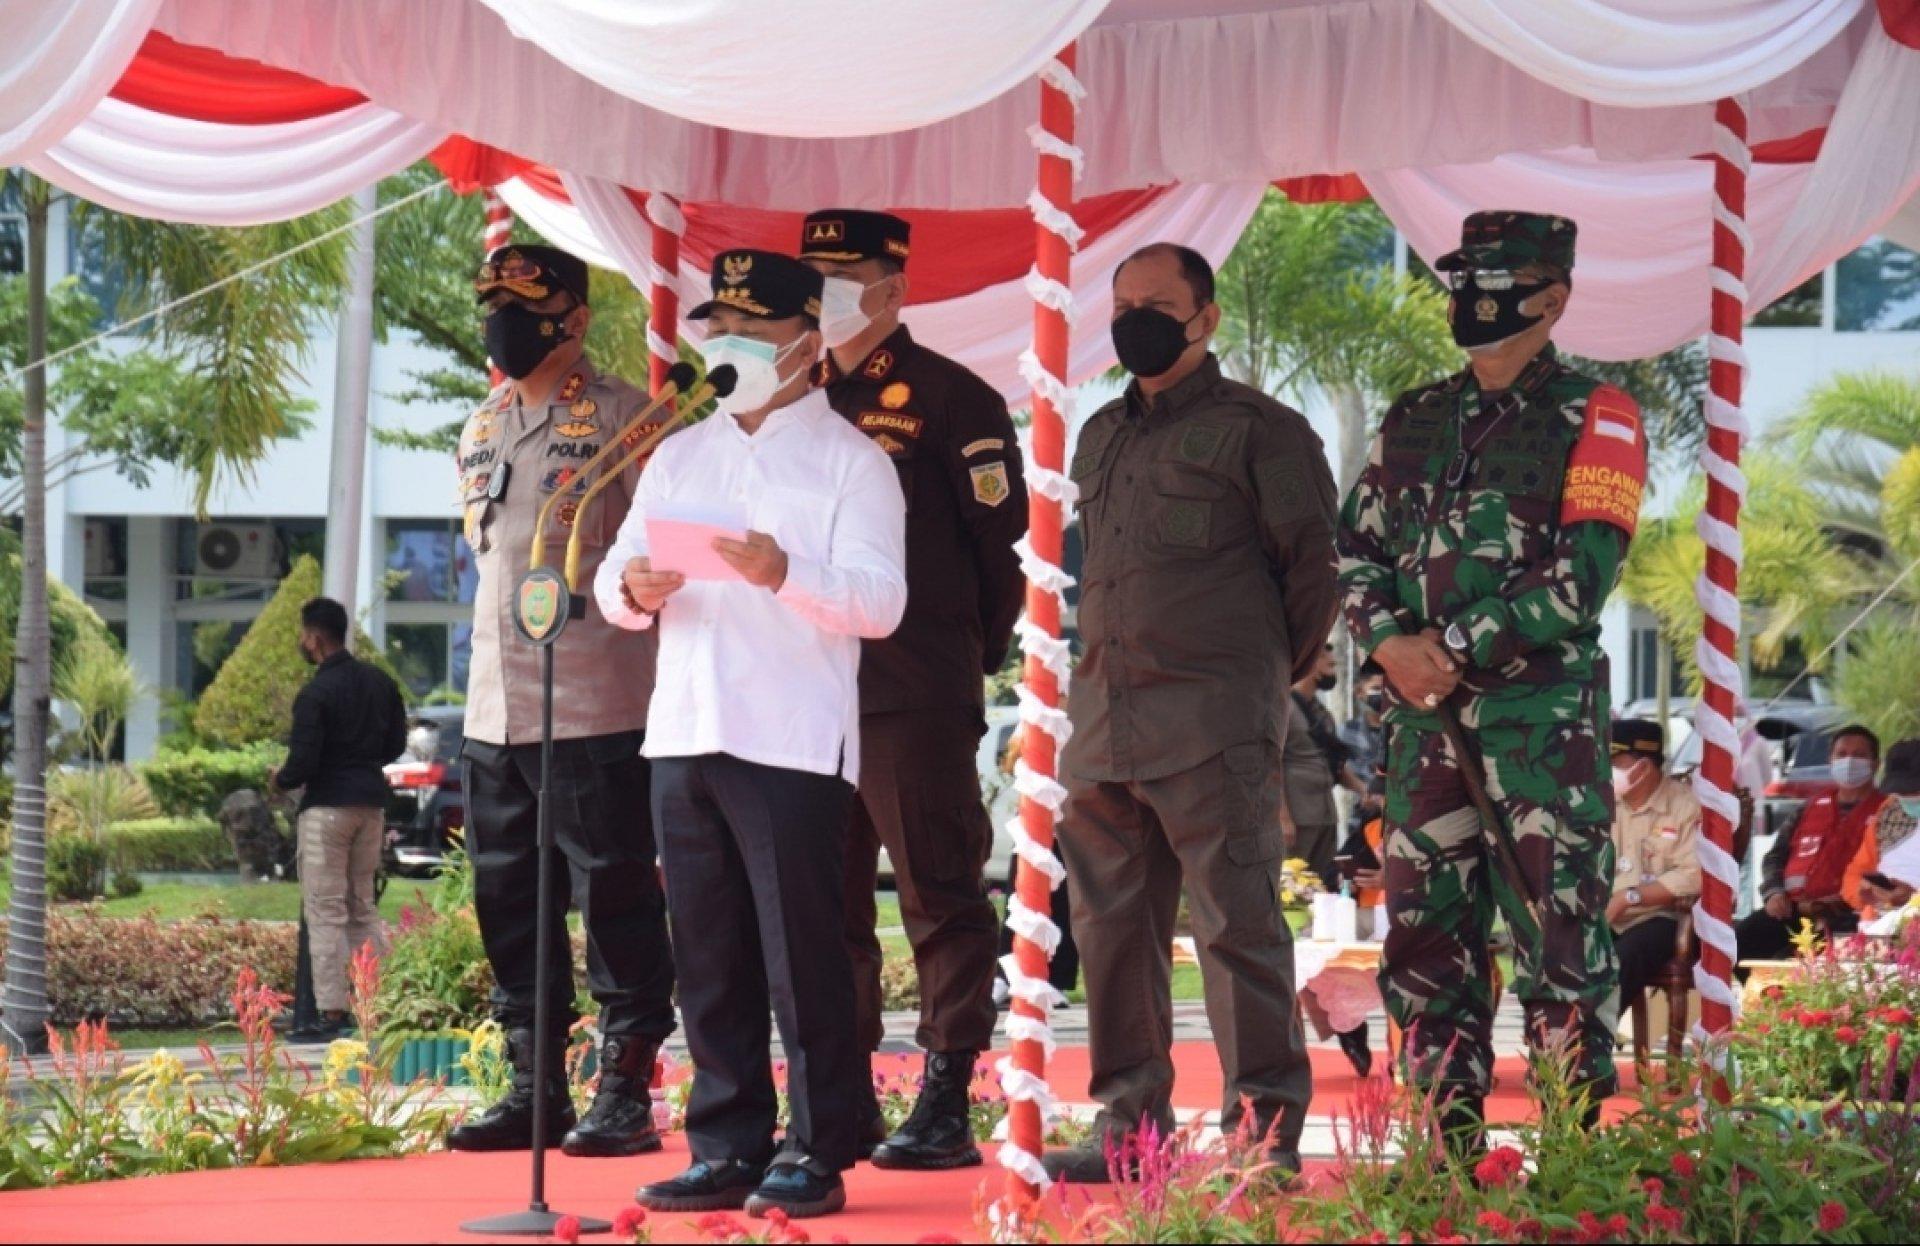 Gubernur Sugianto Sabran Pimpin Apel Gelar Personel dan Sarpras Penanganan Darurat Bencana Banjir di Kalteng